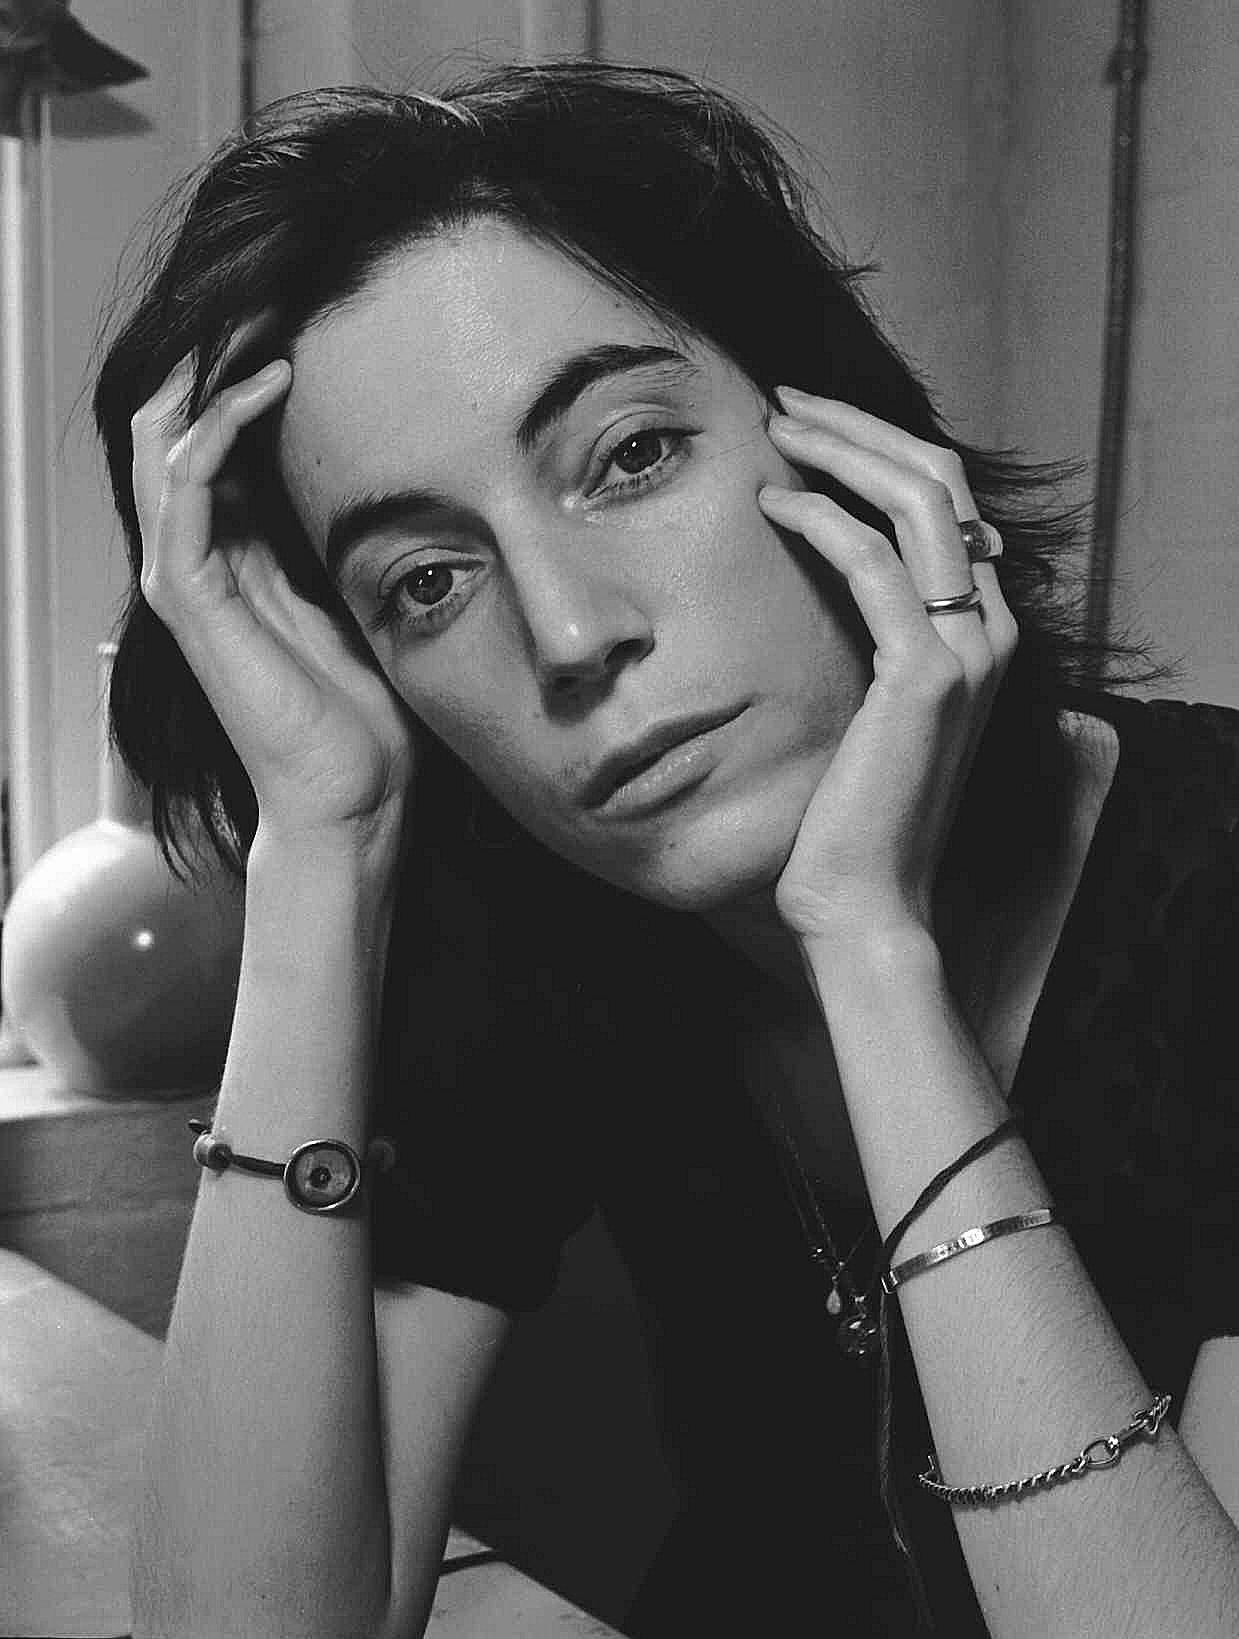 Patti Smith by Frank Stefanko